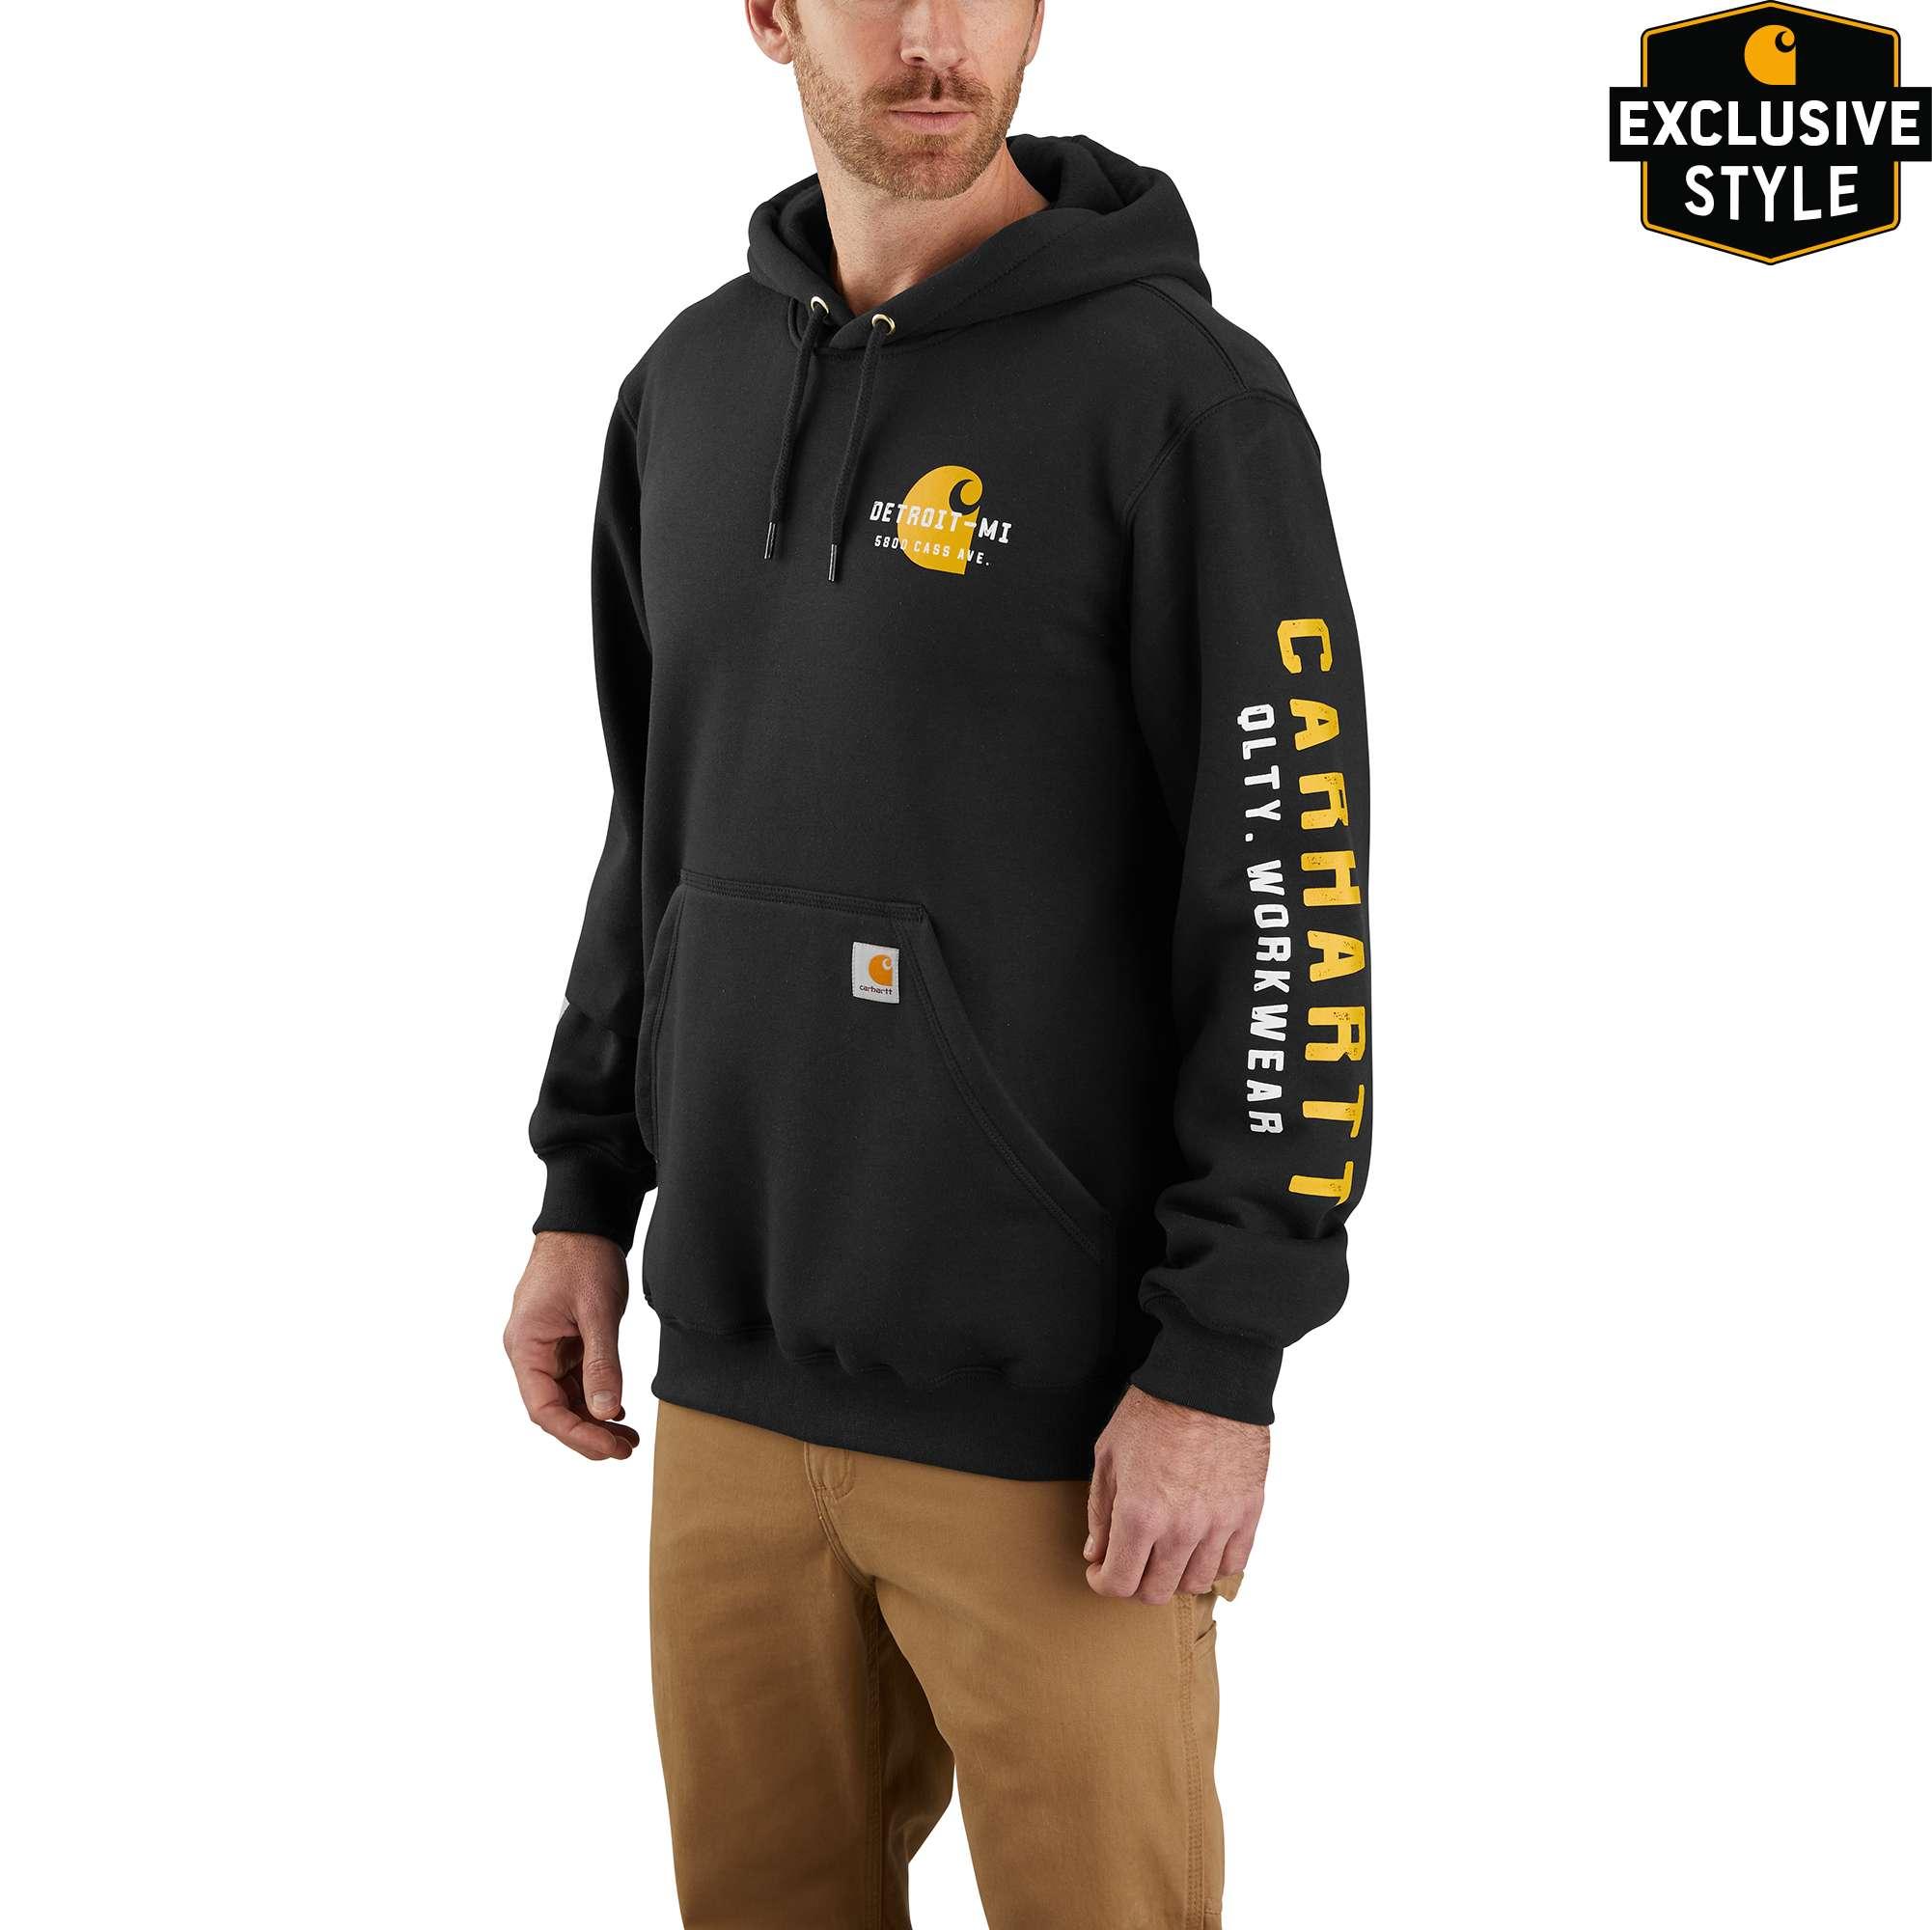 Carhartt Original Fit Midweight Hooded Detroit Graphic Sweatshirt